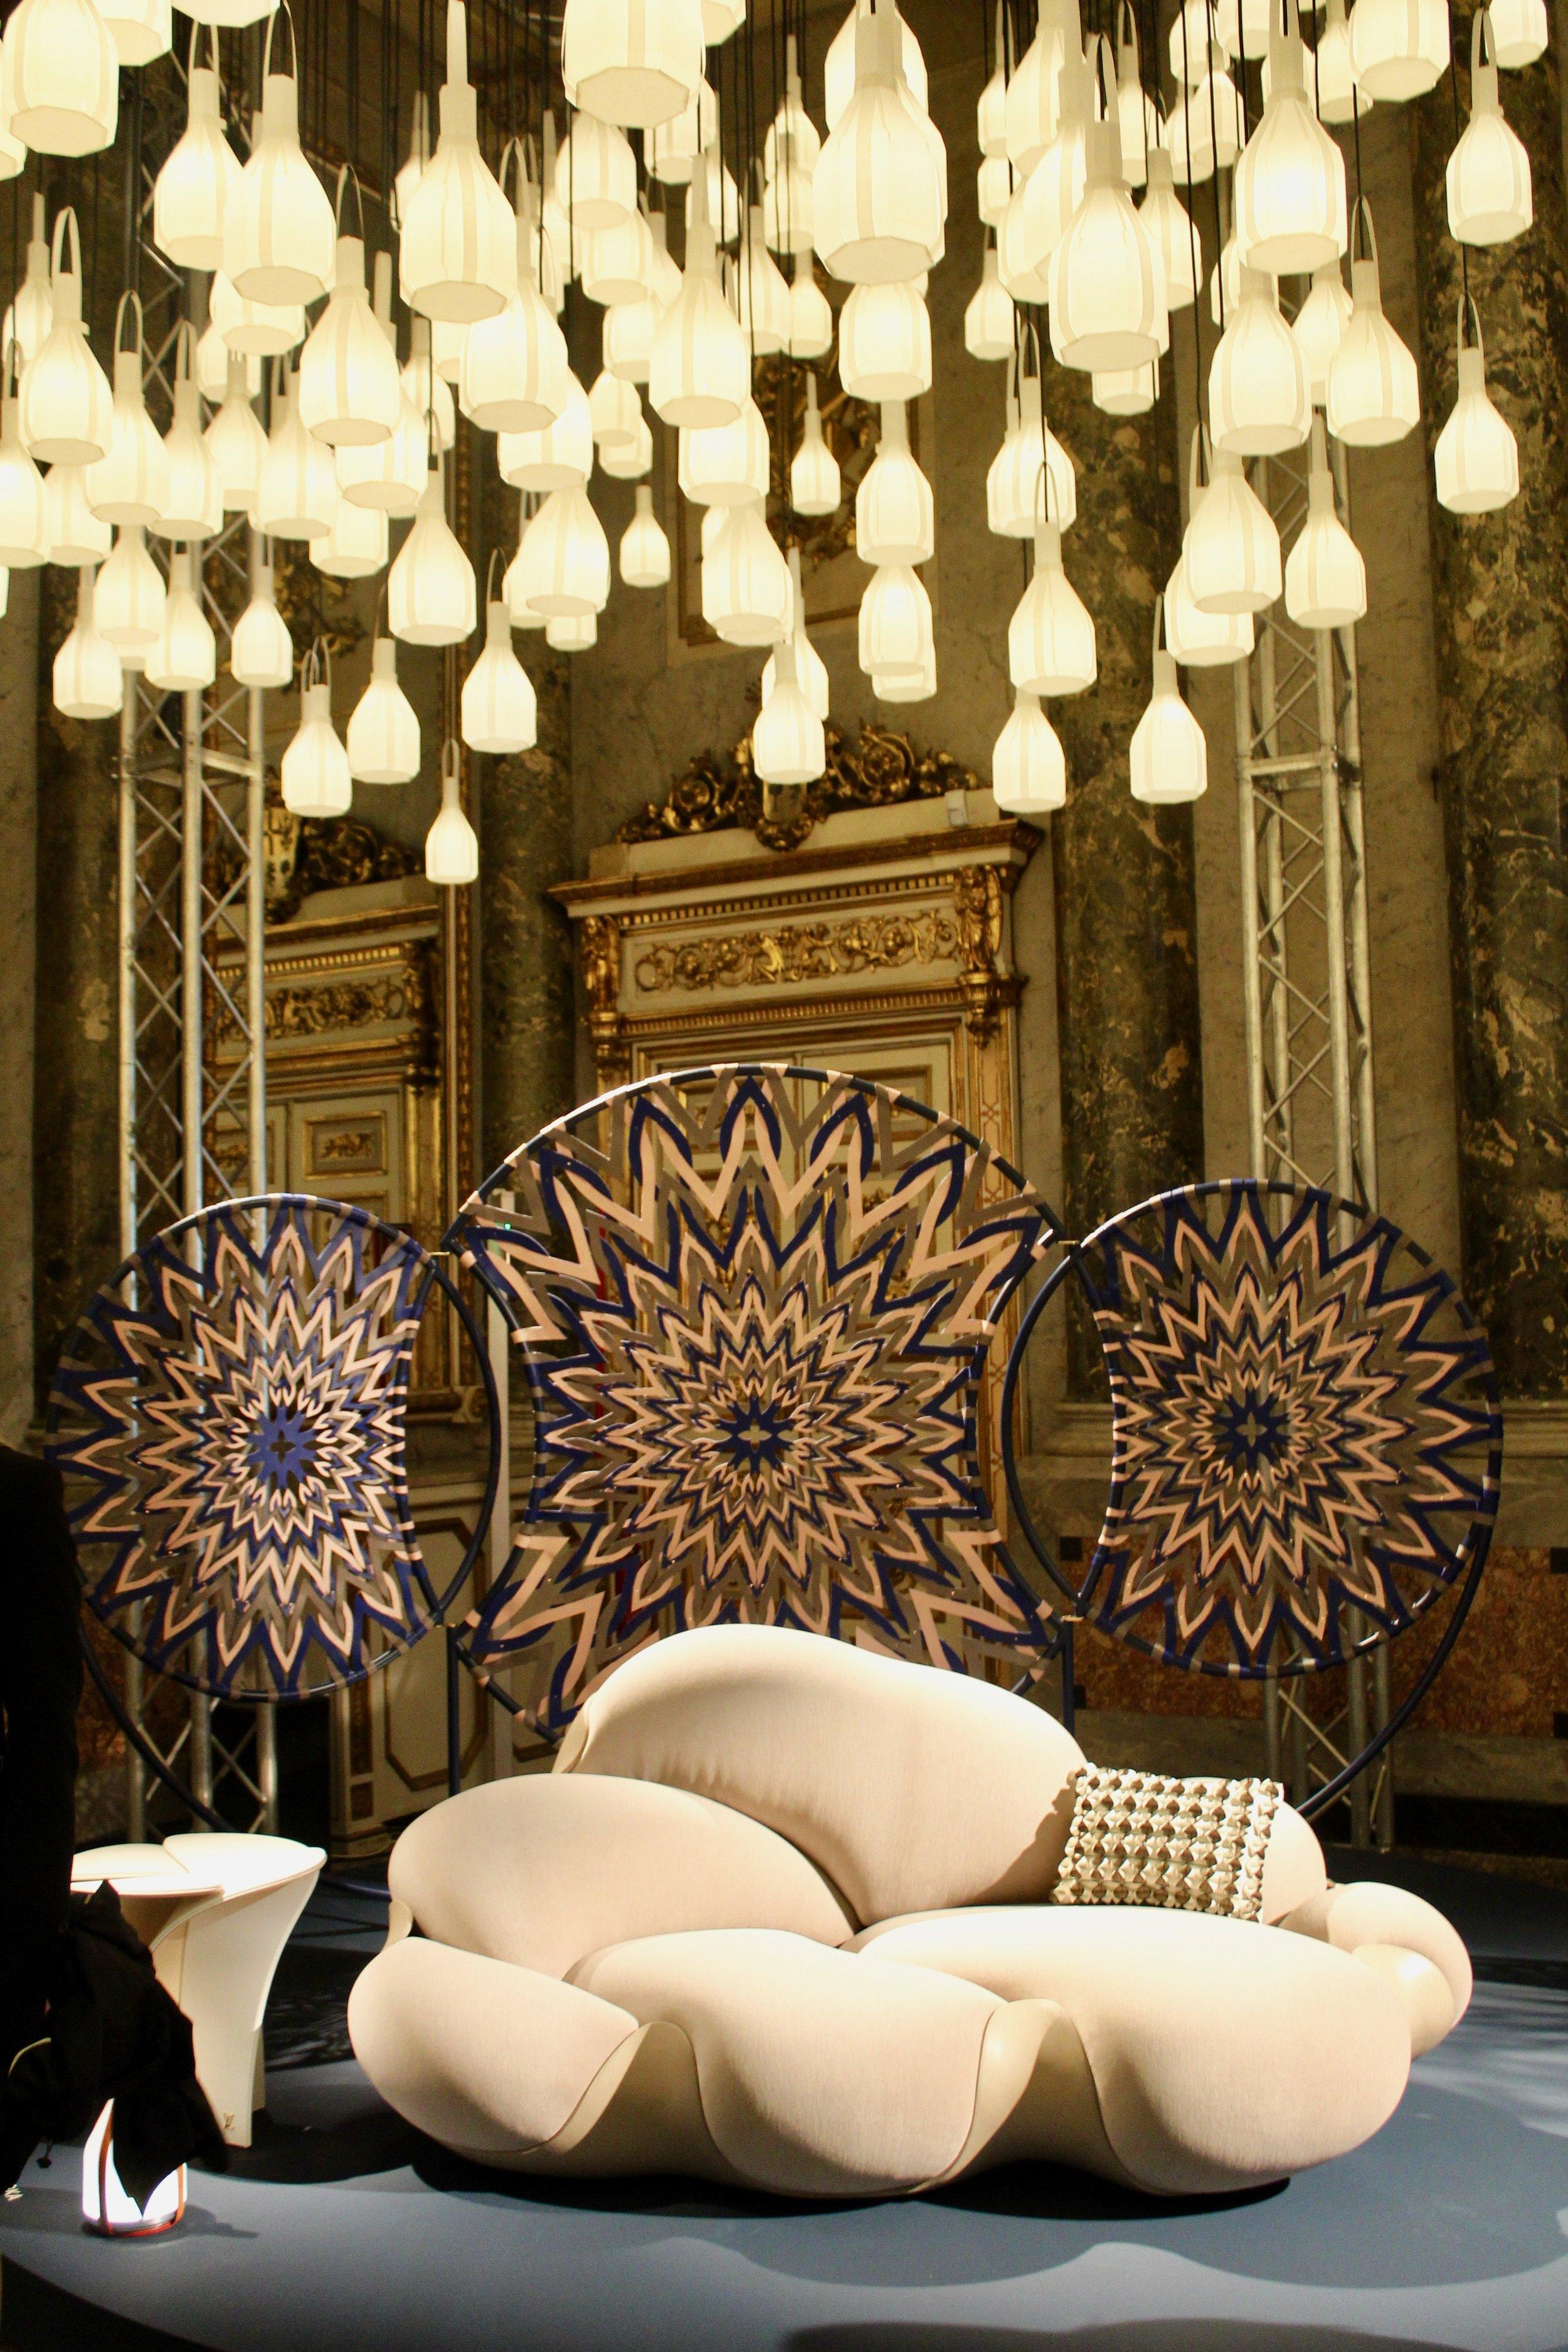 Louis Vuitton 'Objets Nomades' Campana Brothers & Zanellato/Bortotto photography thatssocool